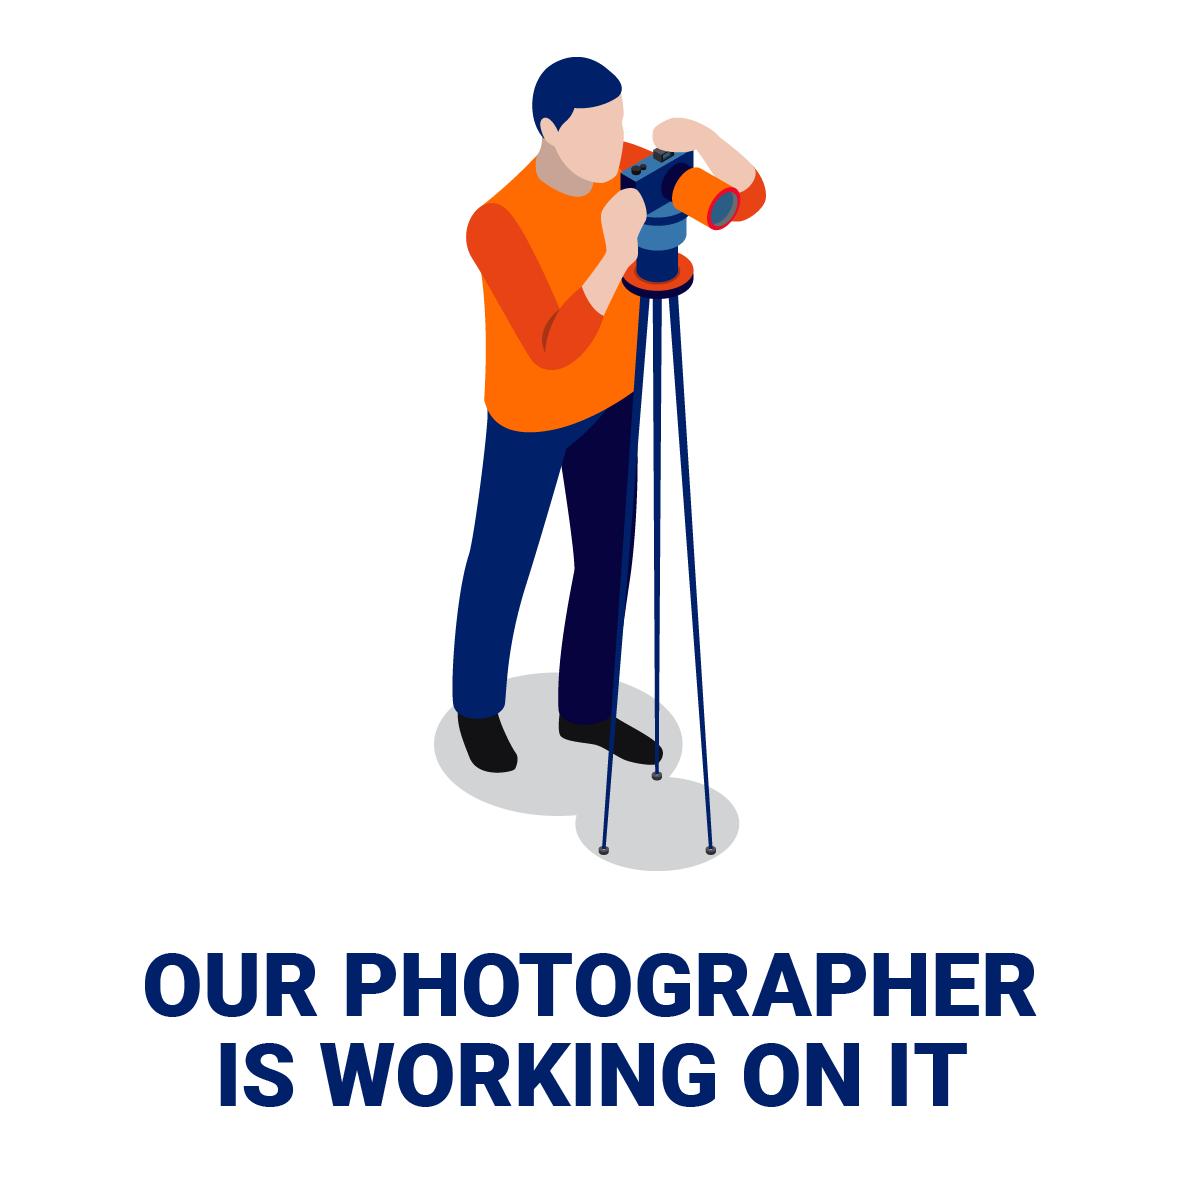 FHV0D R820 HEATSINK2